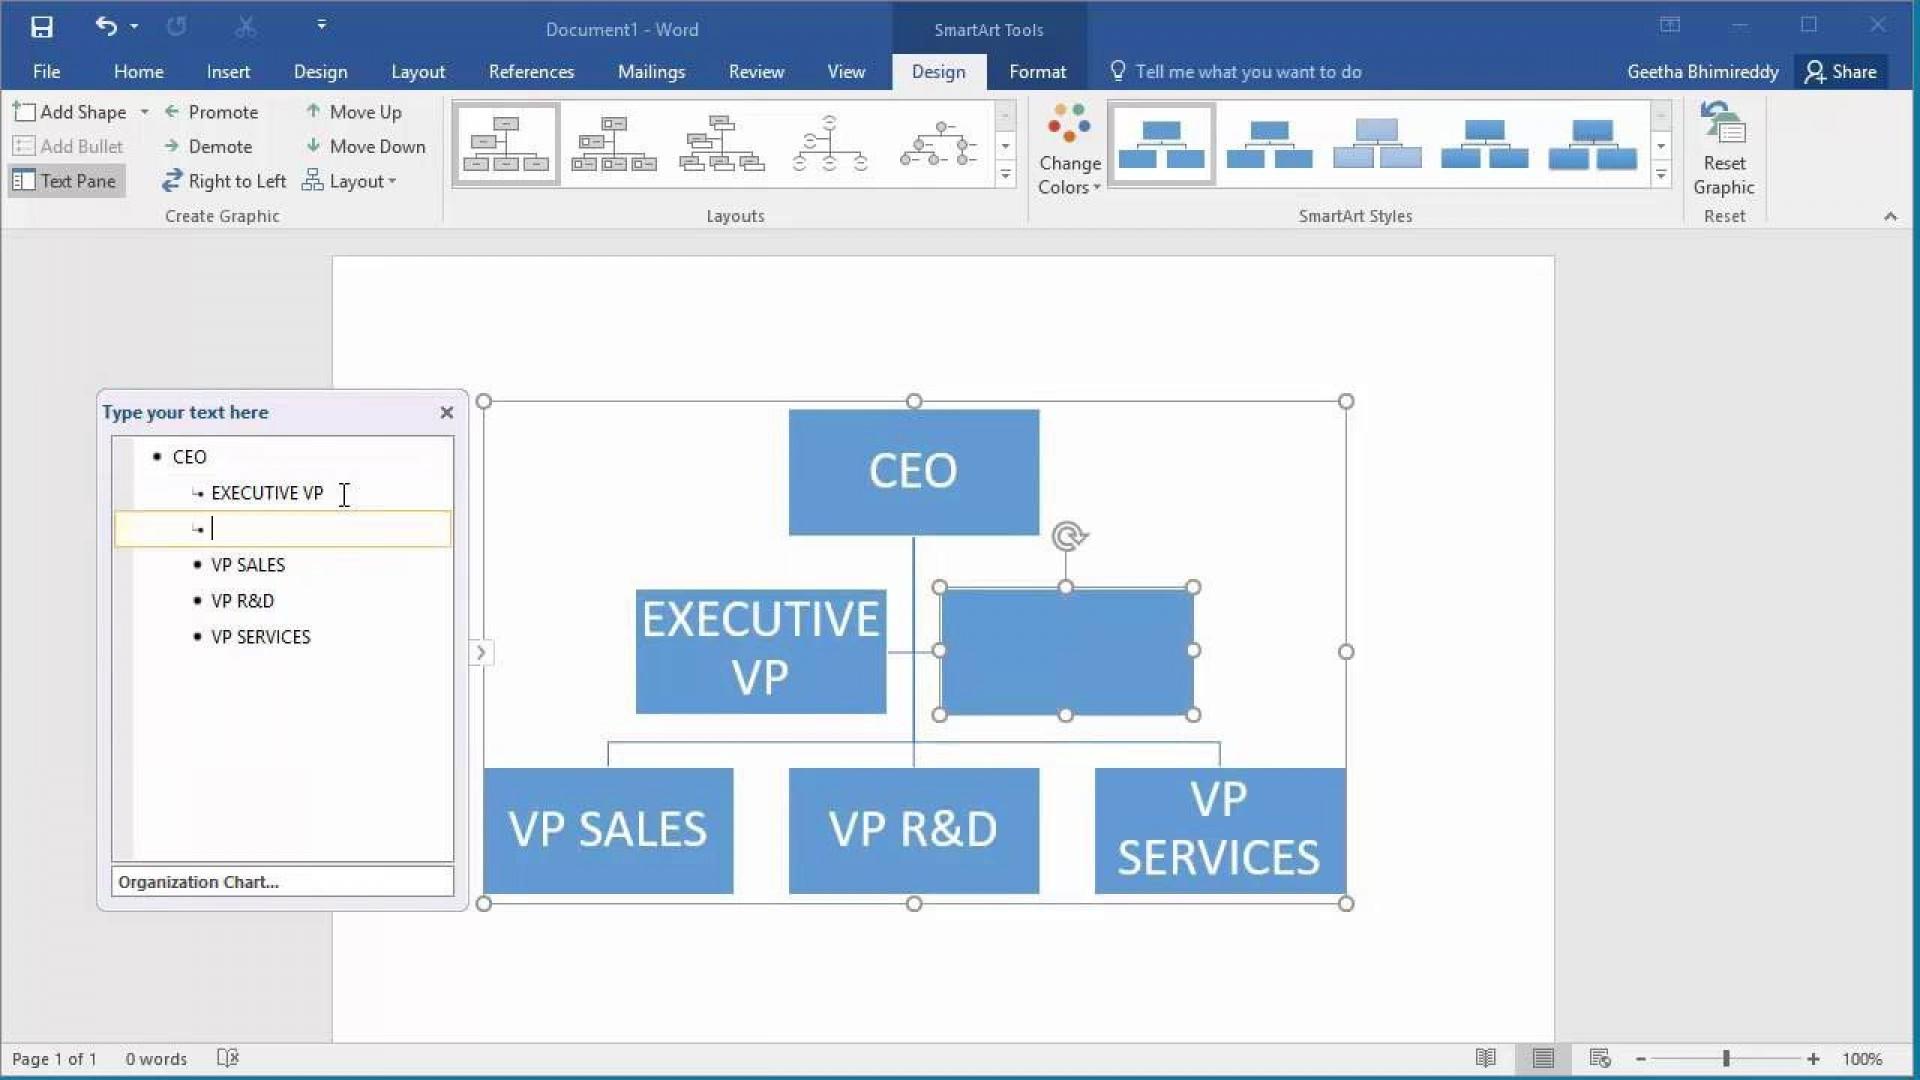 007 Rare Microsoft Office Organizational Chart Template 2010 Highest Clarity 1920